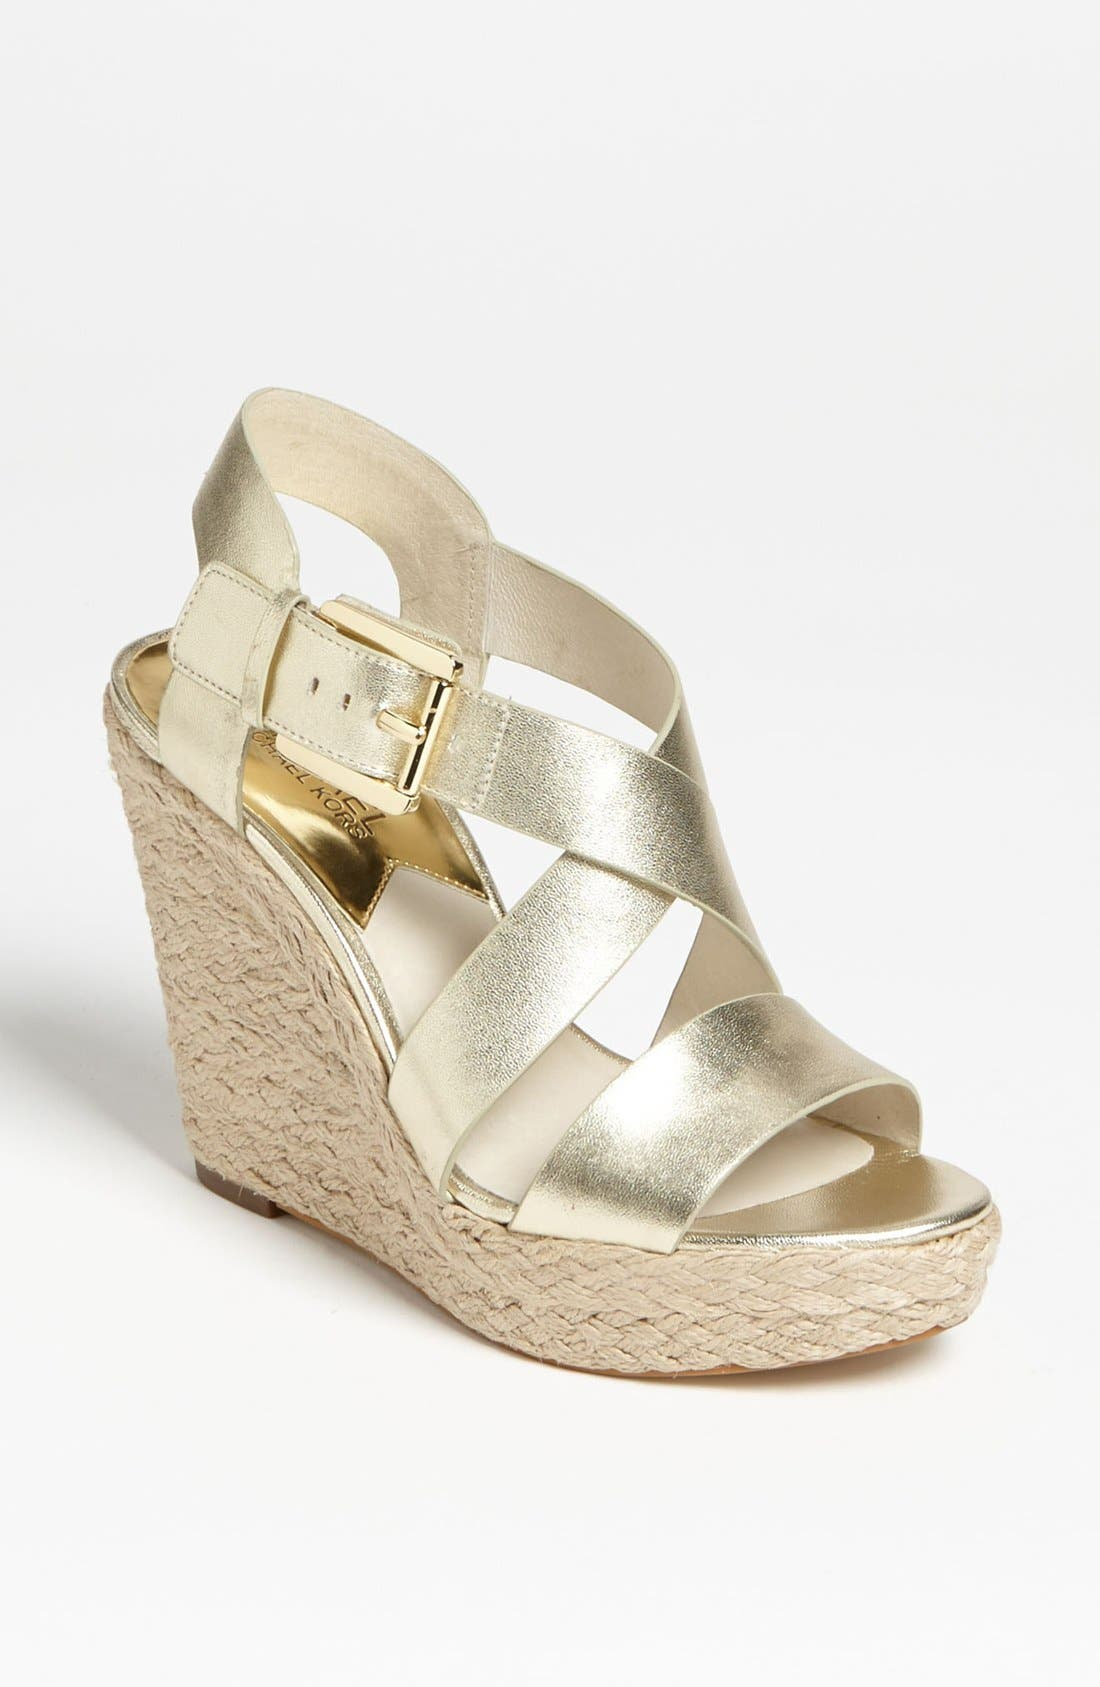 Main Image - MICHAEL Michael Kors 'Giovanna' Wedge Sandal